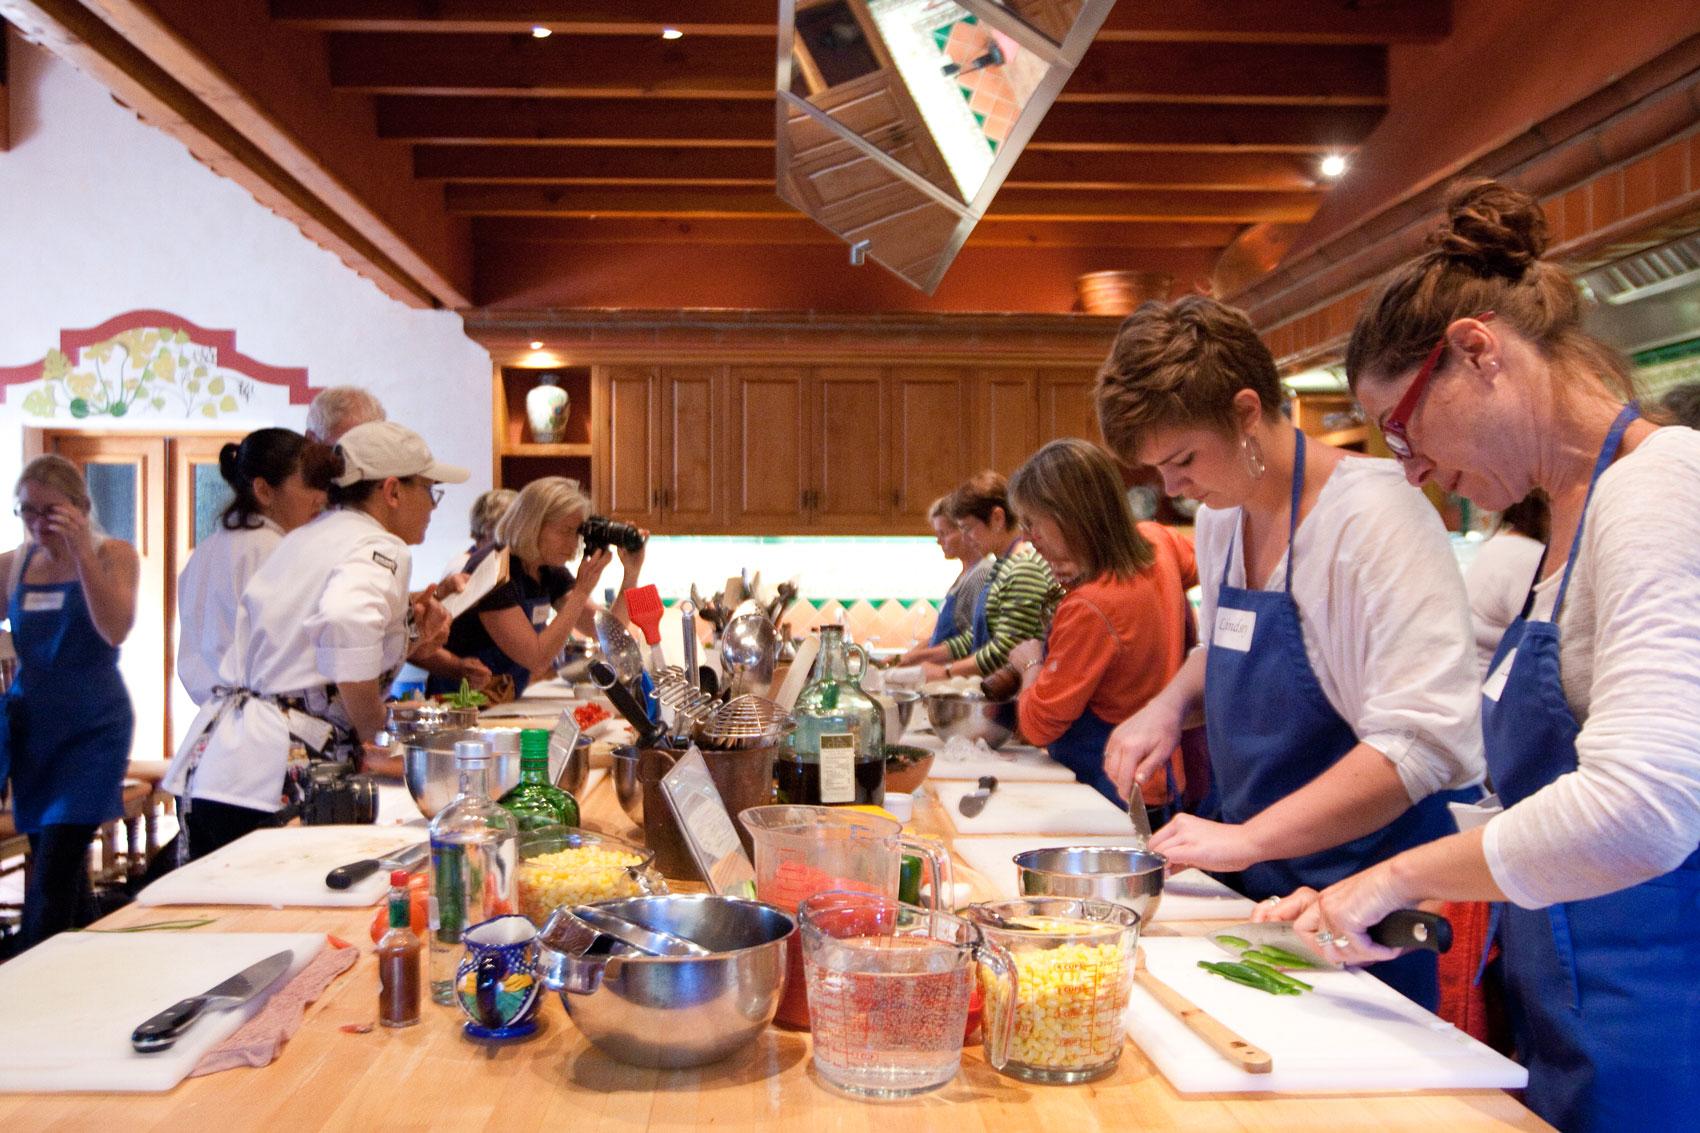 Rancho_La_Purta_Cooking_Class_1.jpg